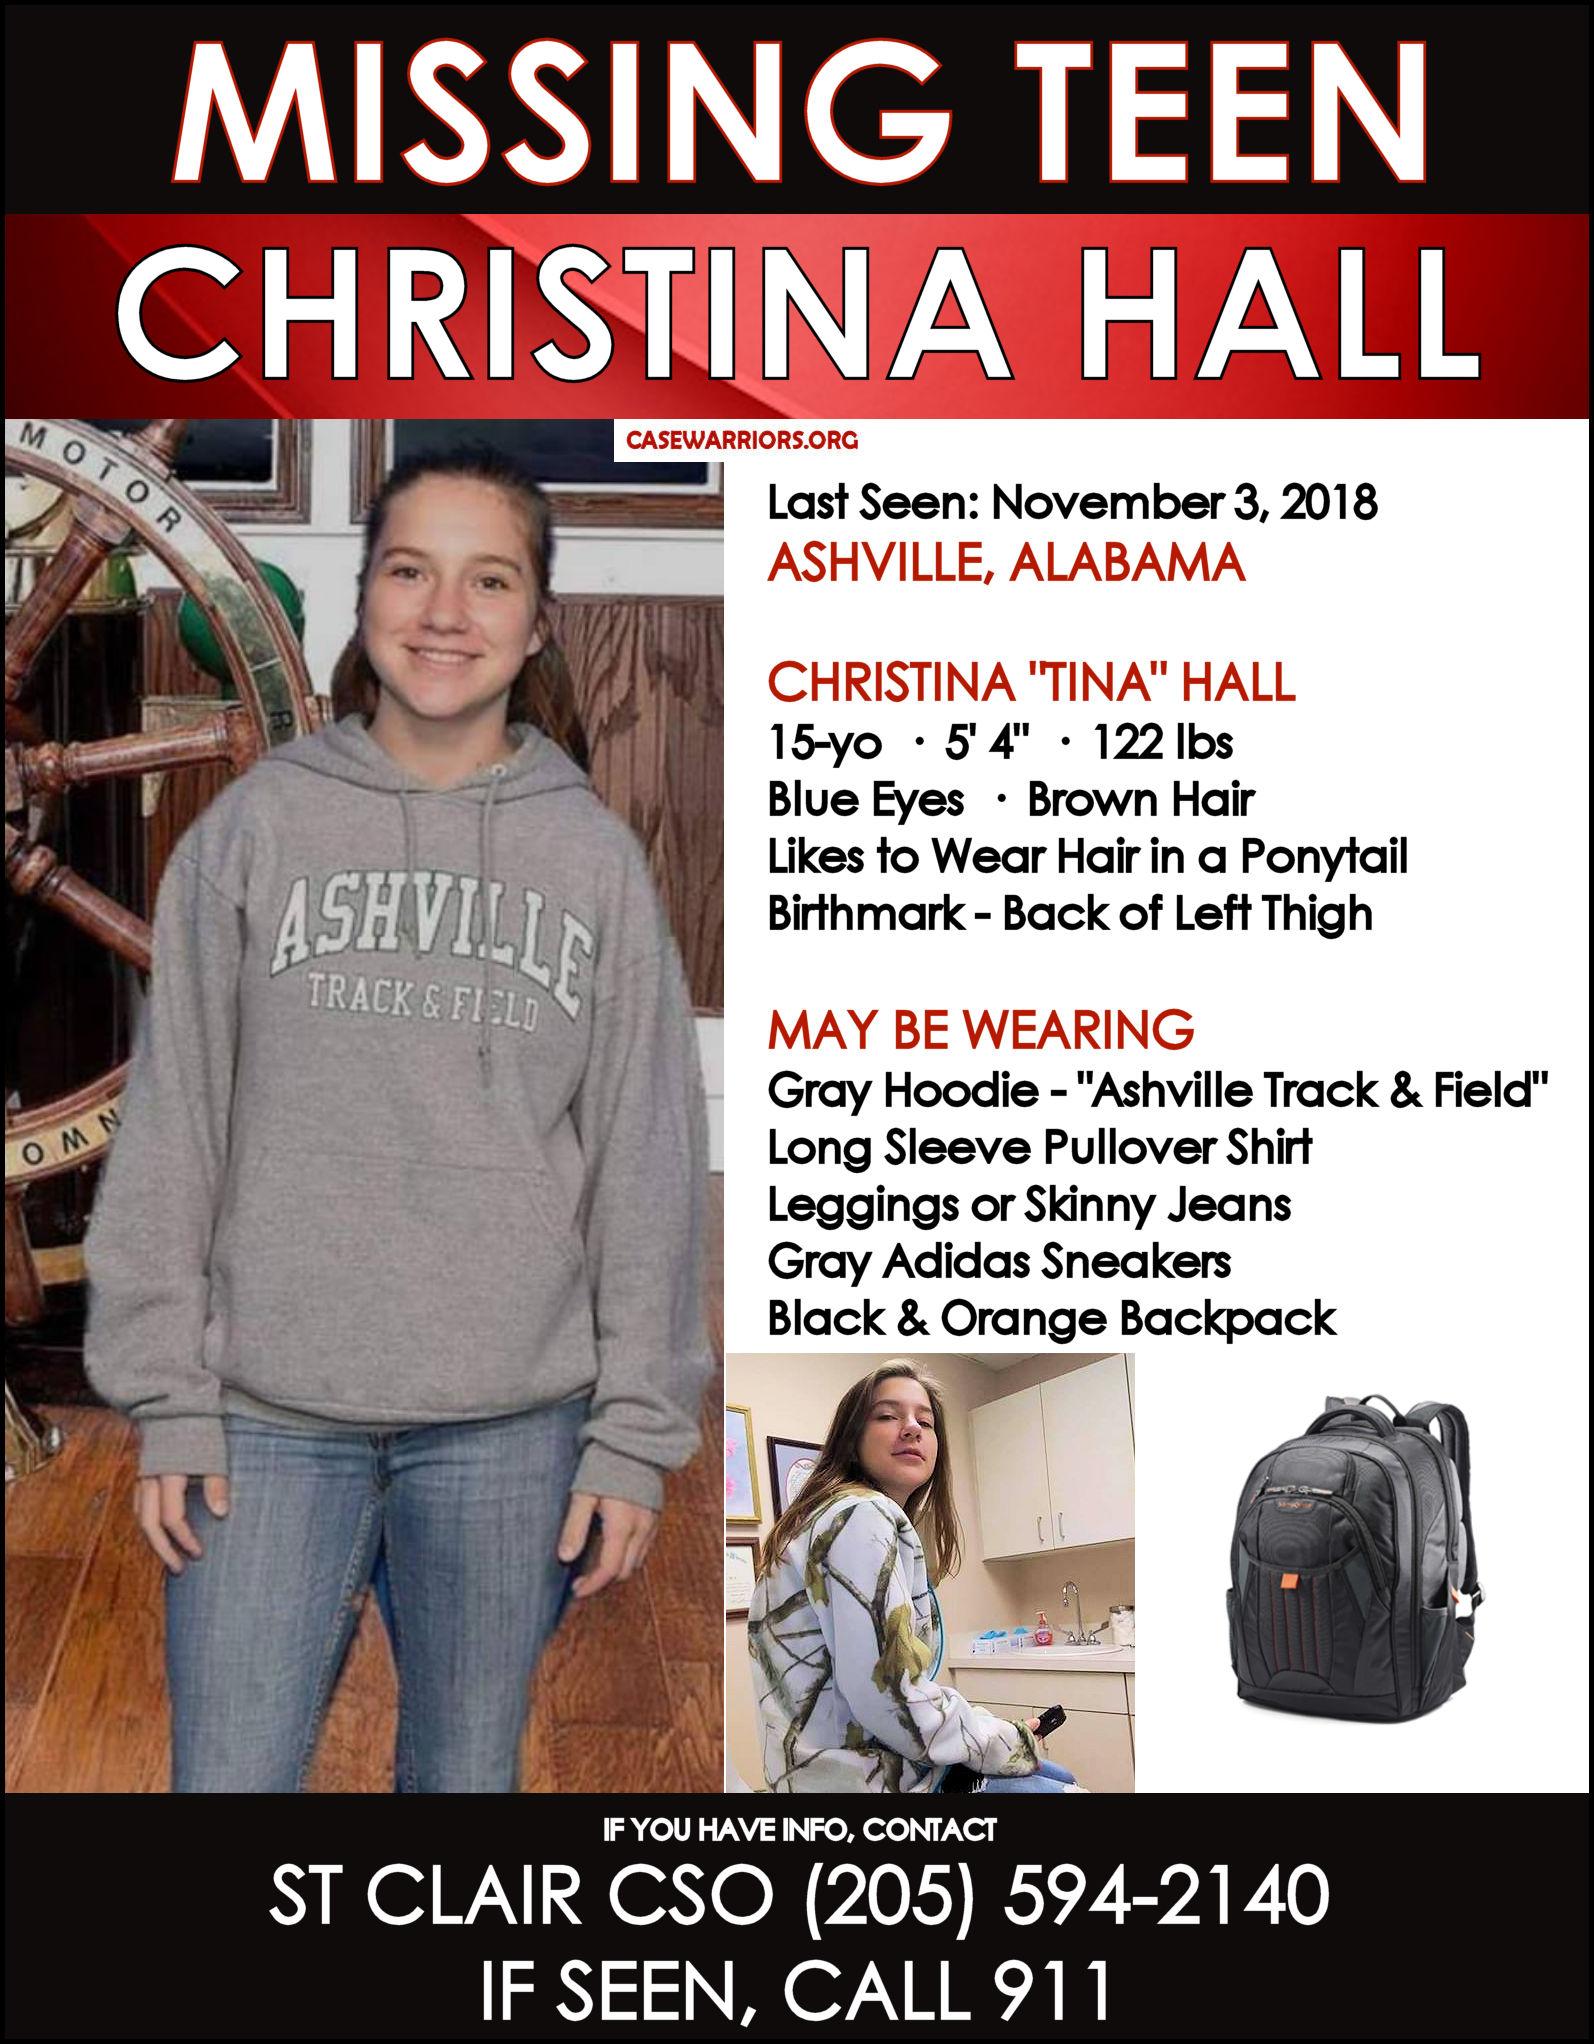 CHRISTINA HALL